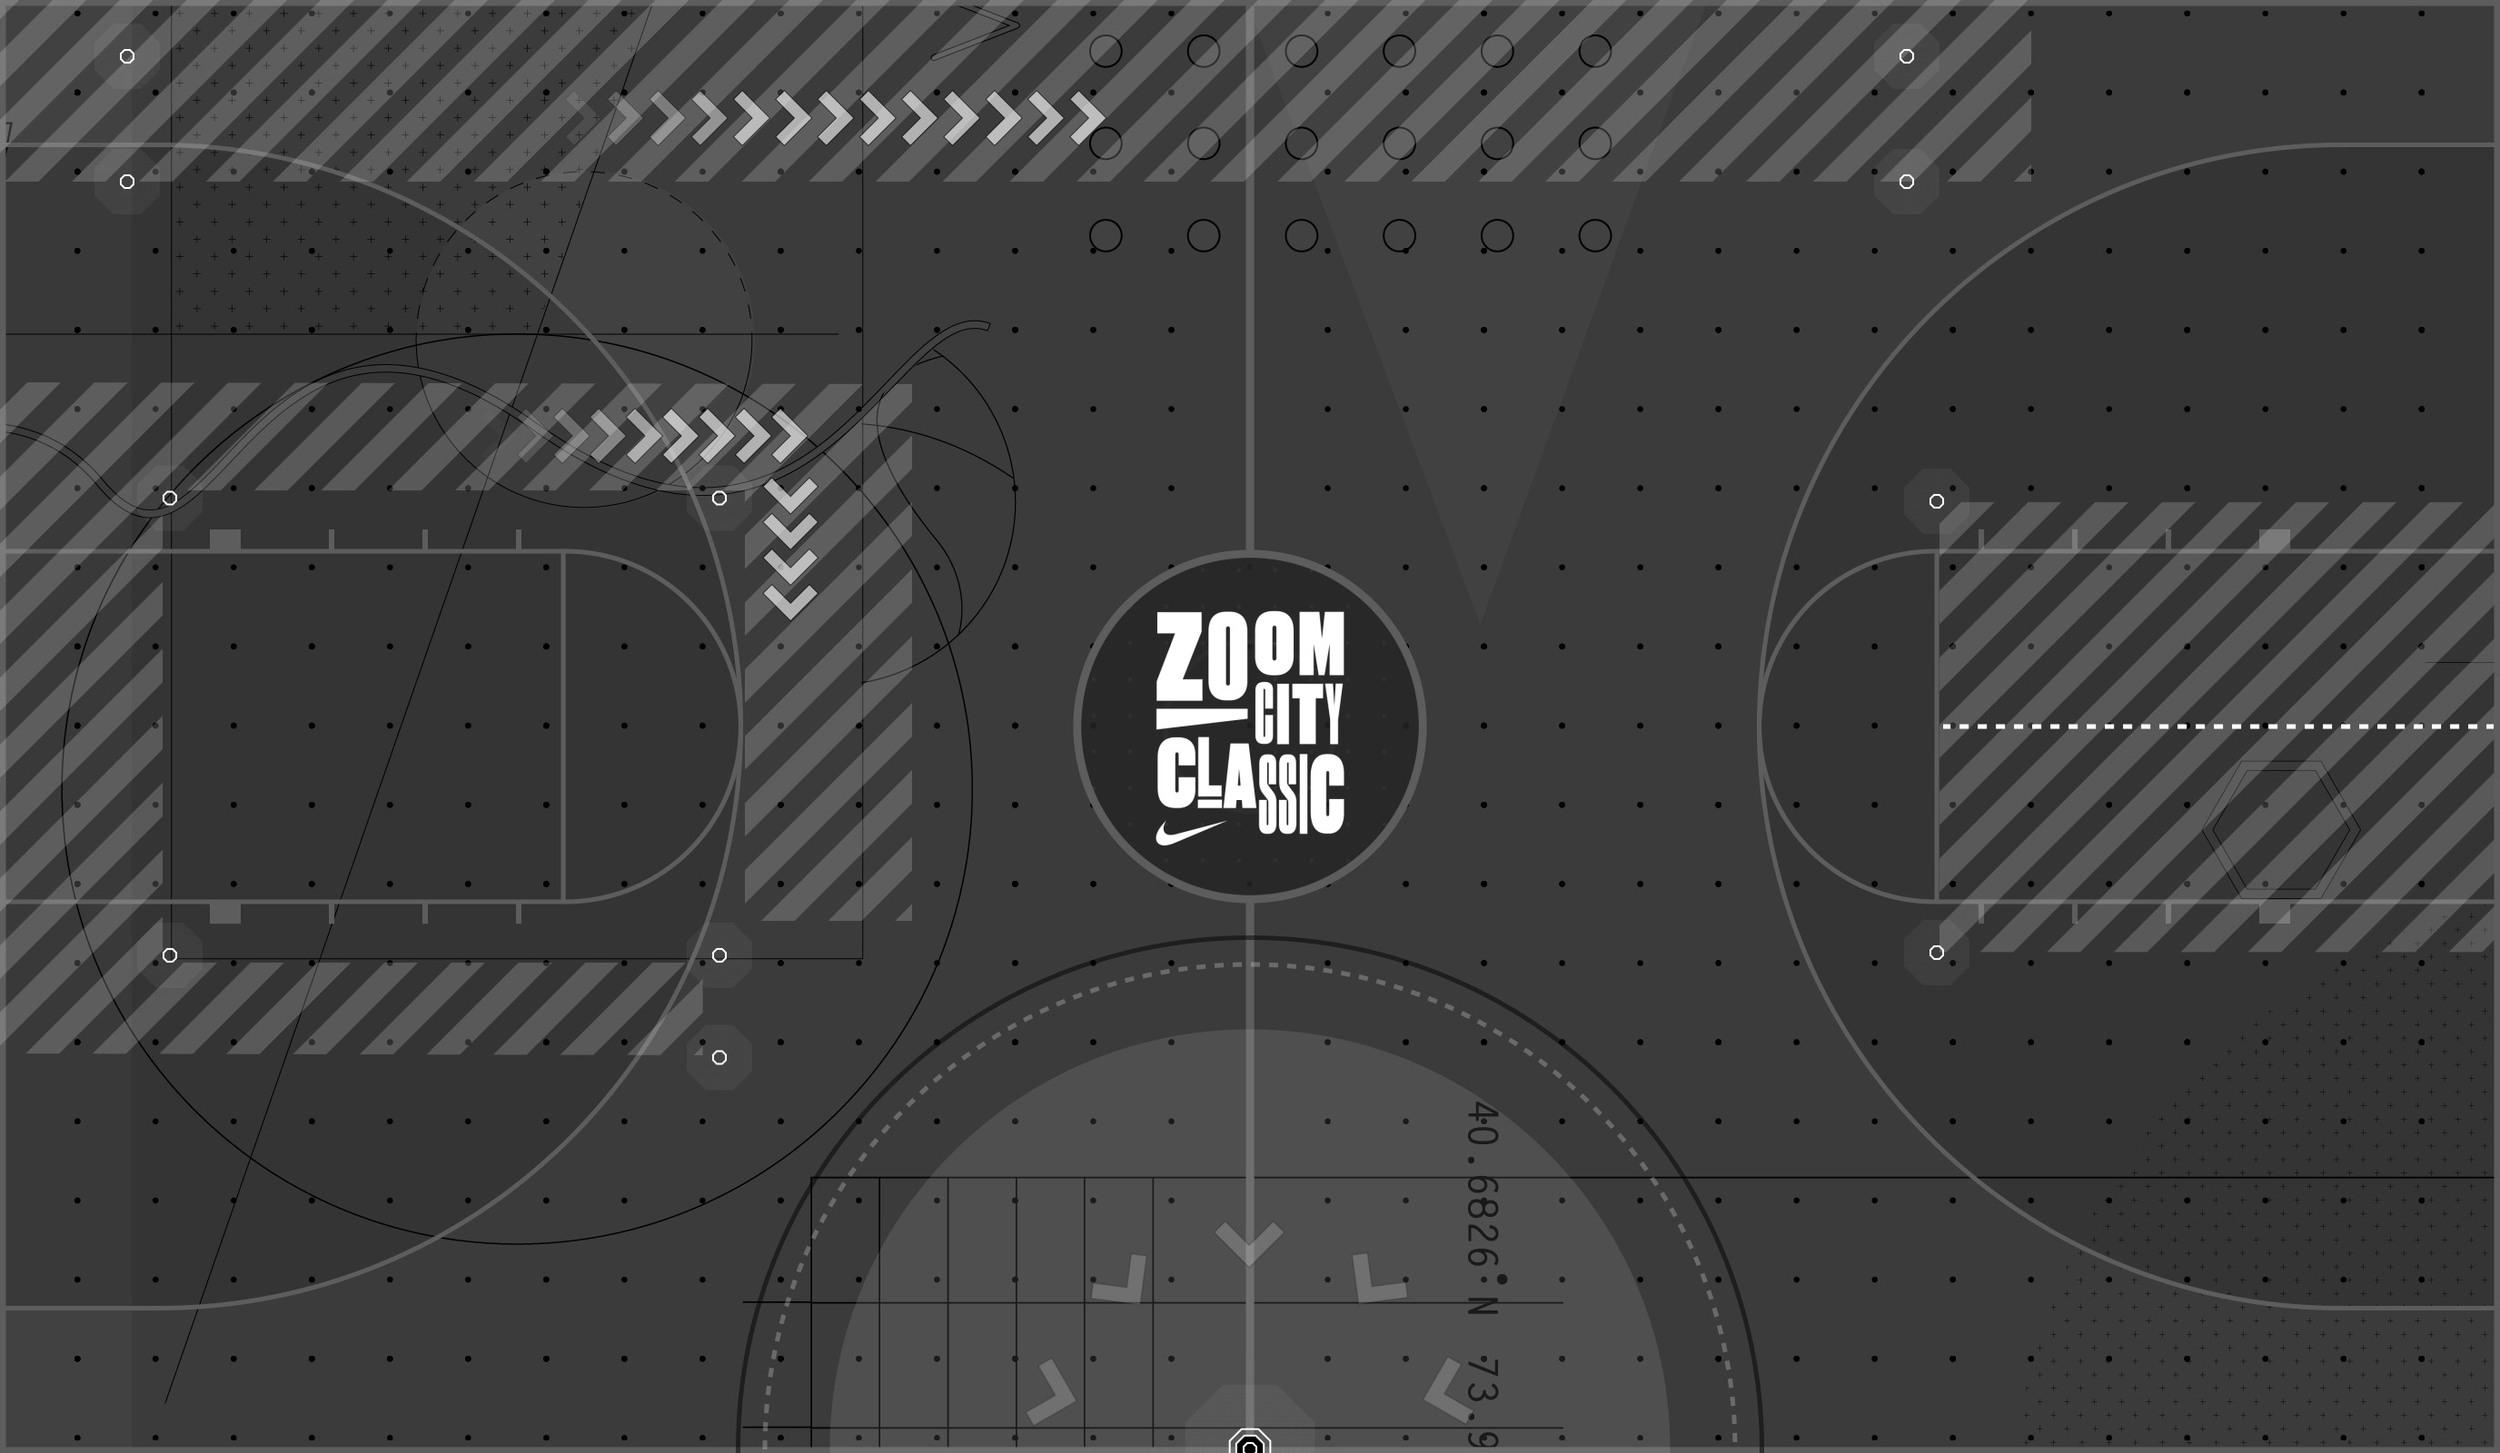 NZC_New+Court+Layout_02.jpg